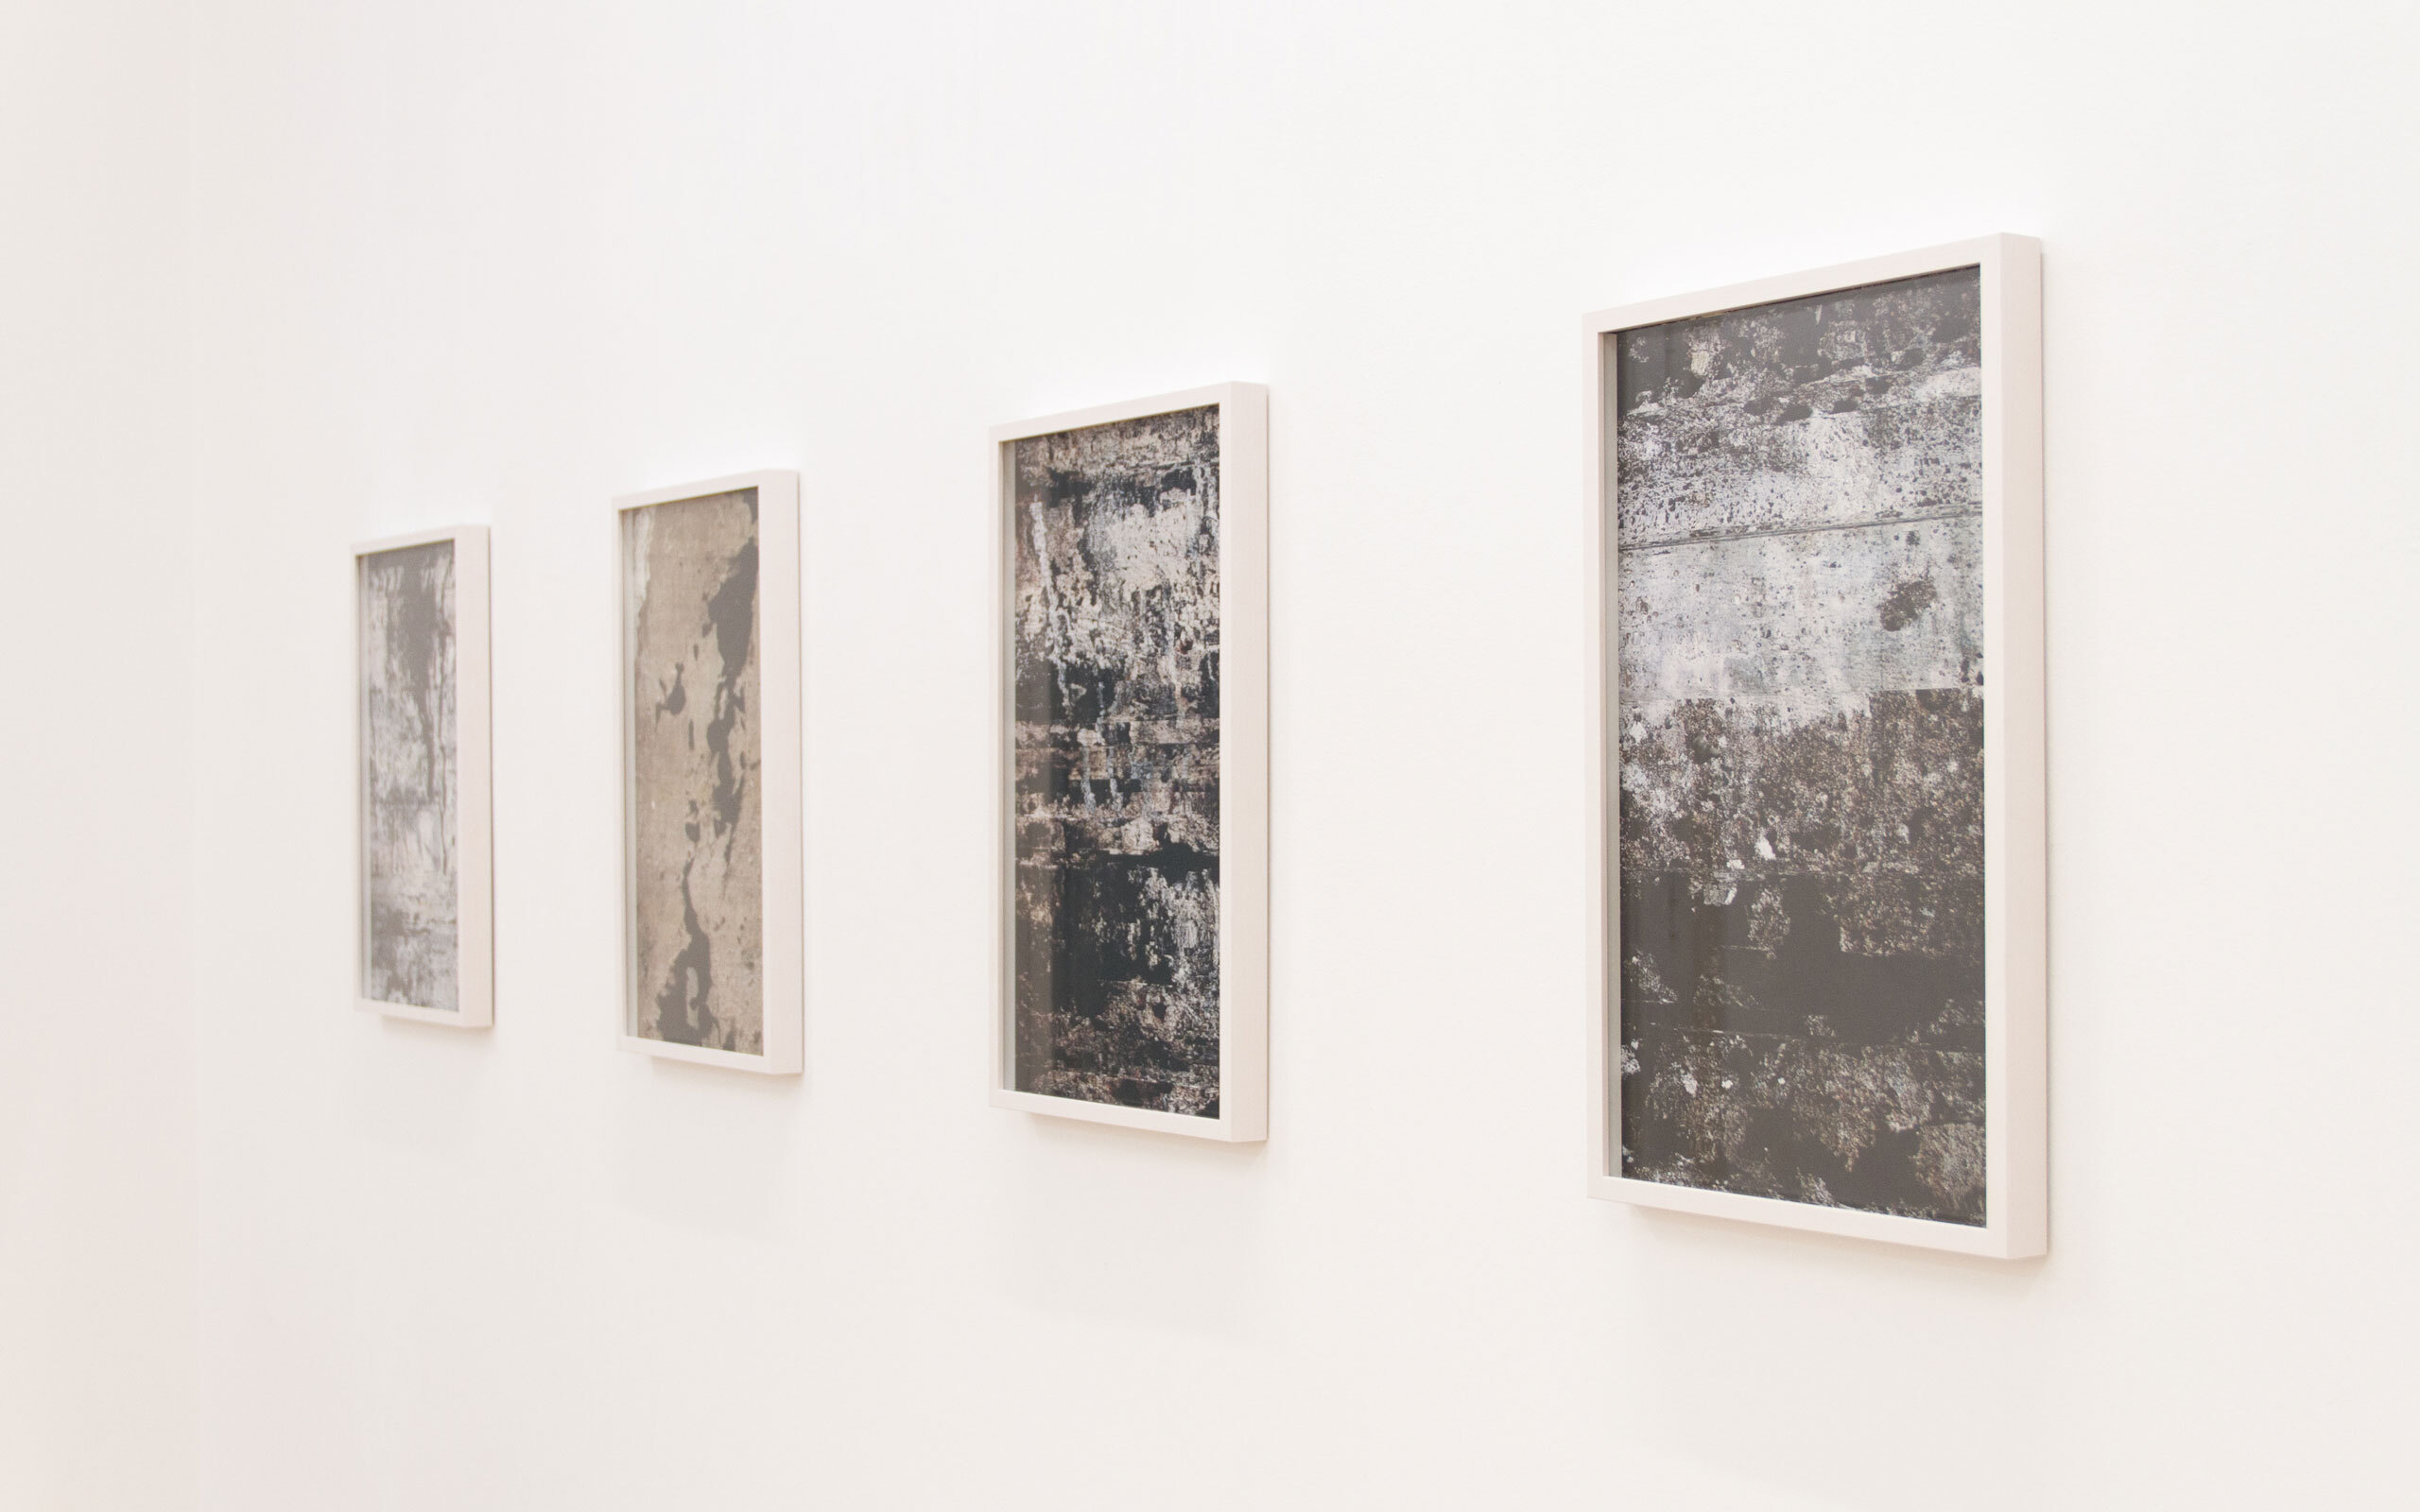 03 John Skoog Walls